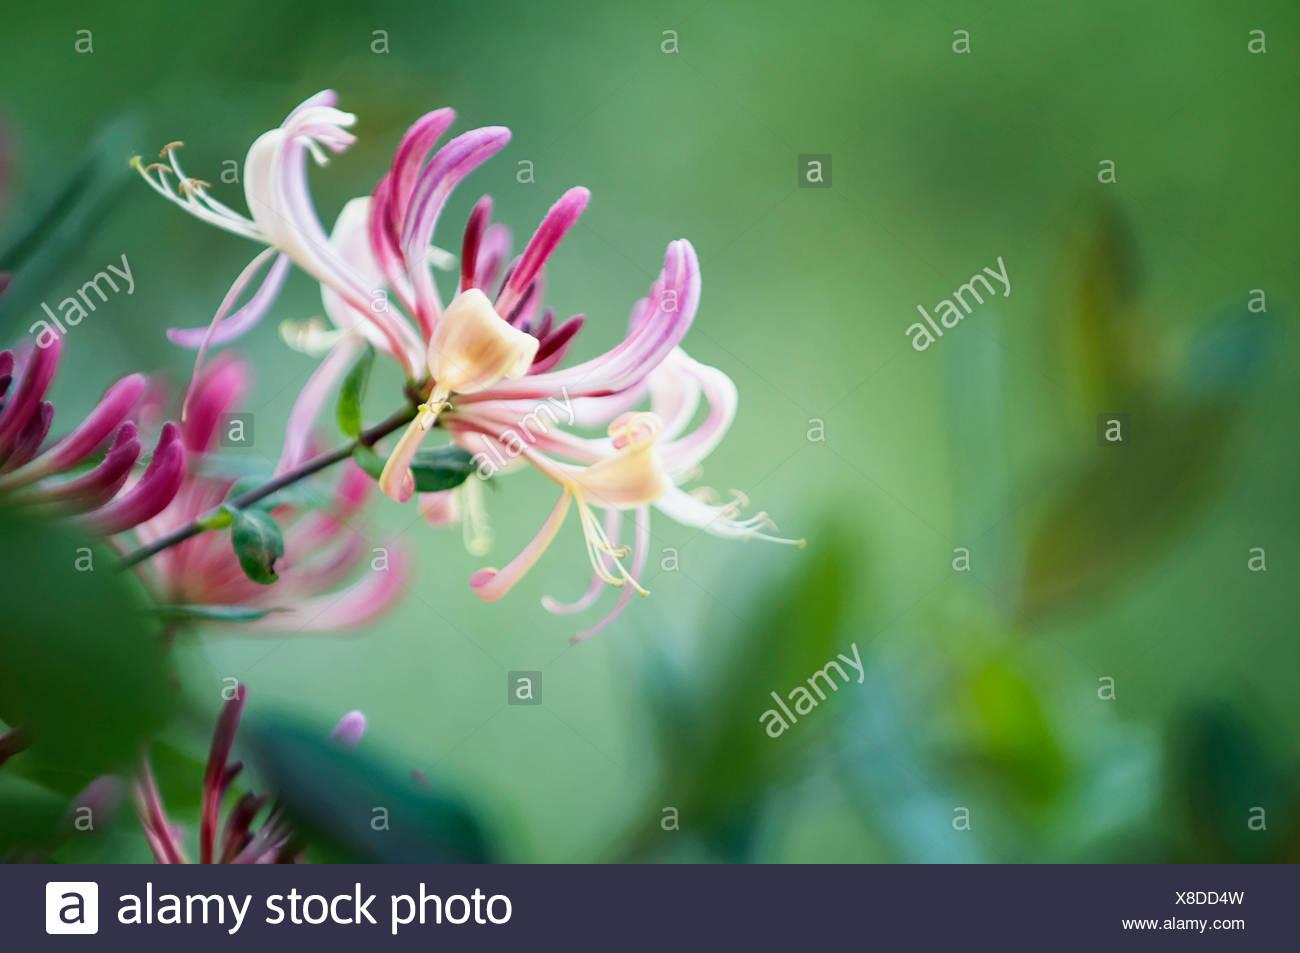 Lonicera Periclymenum Honeysuckle Purple And Cream Coloured